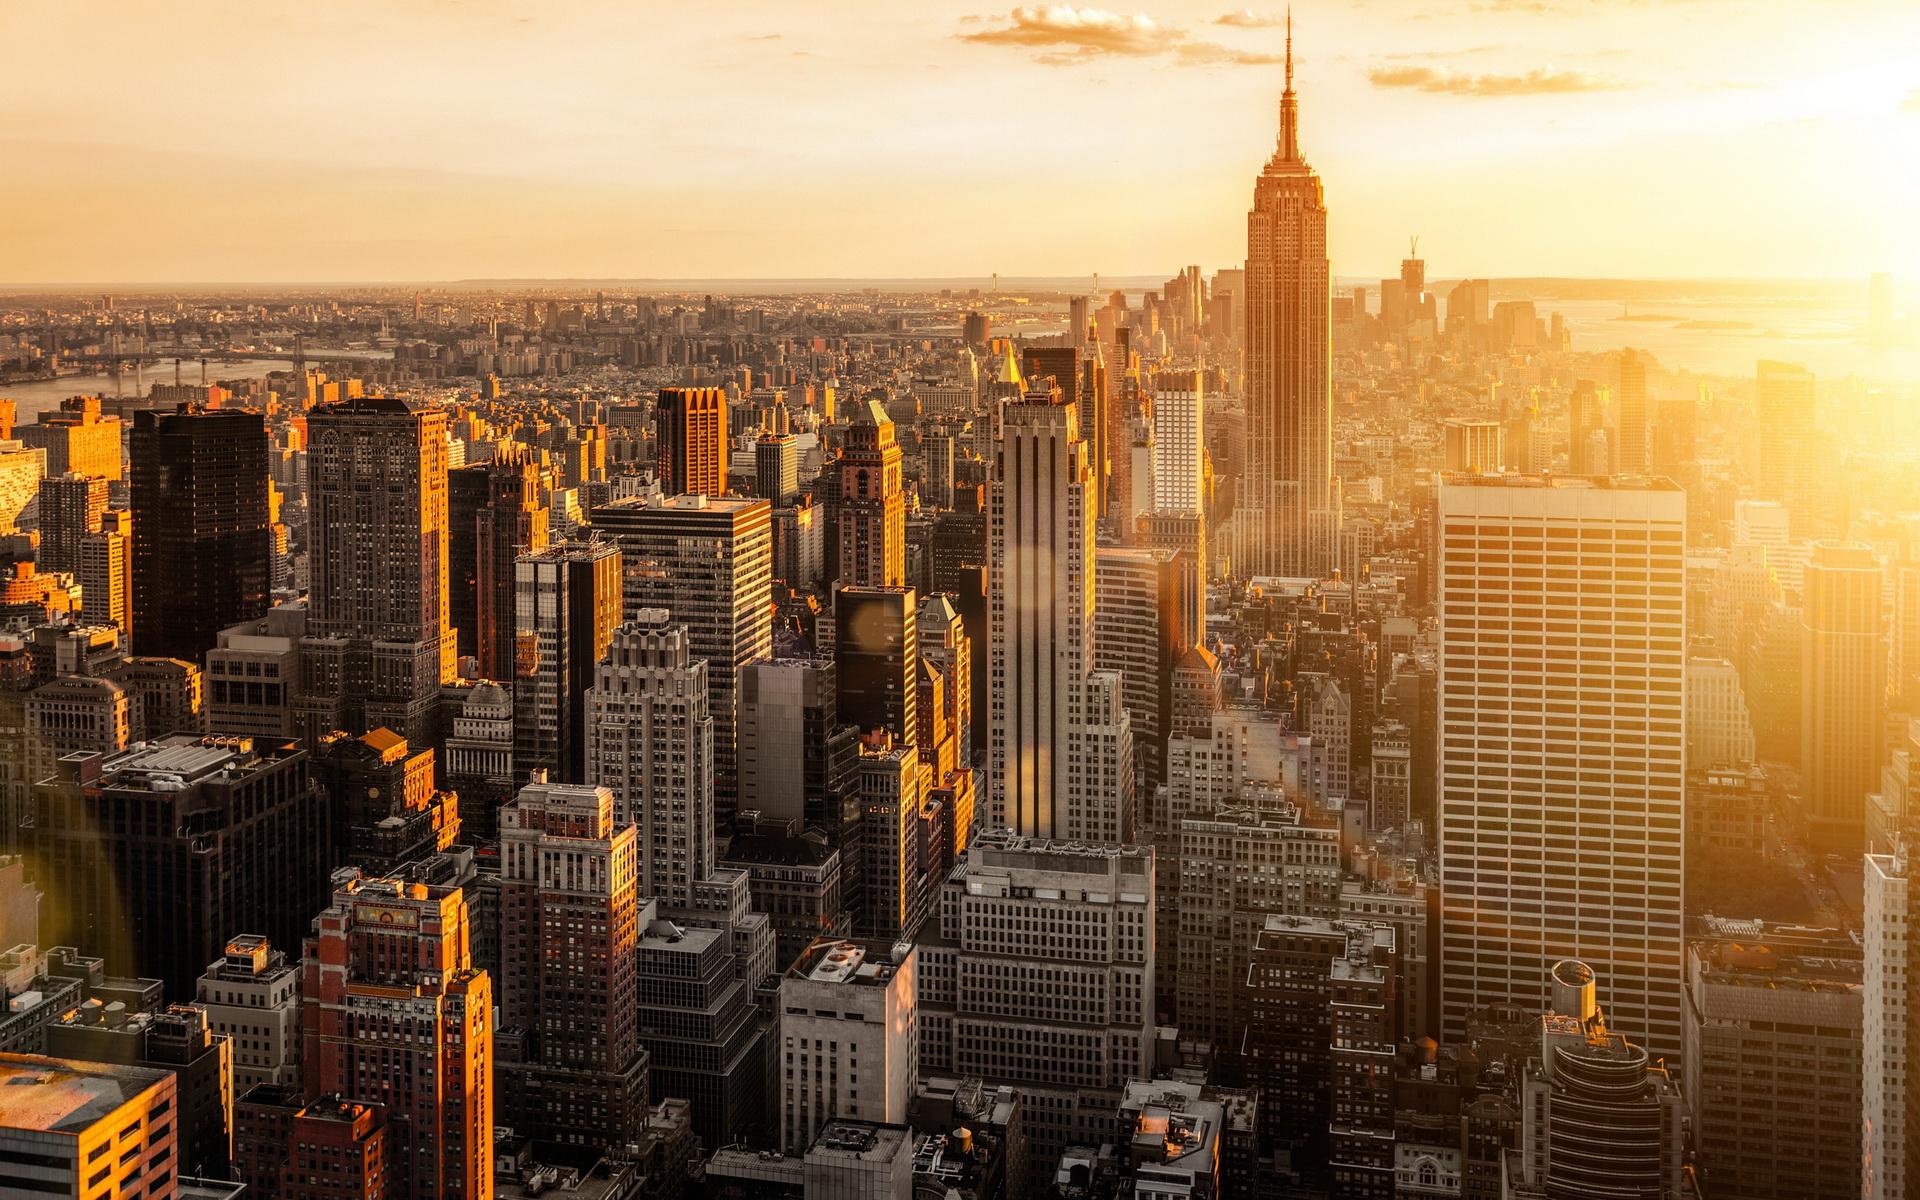 Fondos de pantalla de nueva york wallpapers new york hd for What to do in new york new york